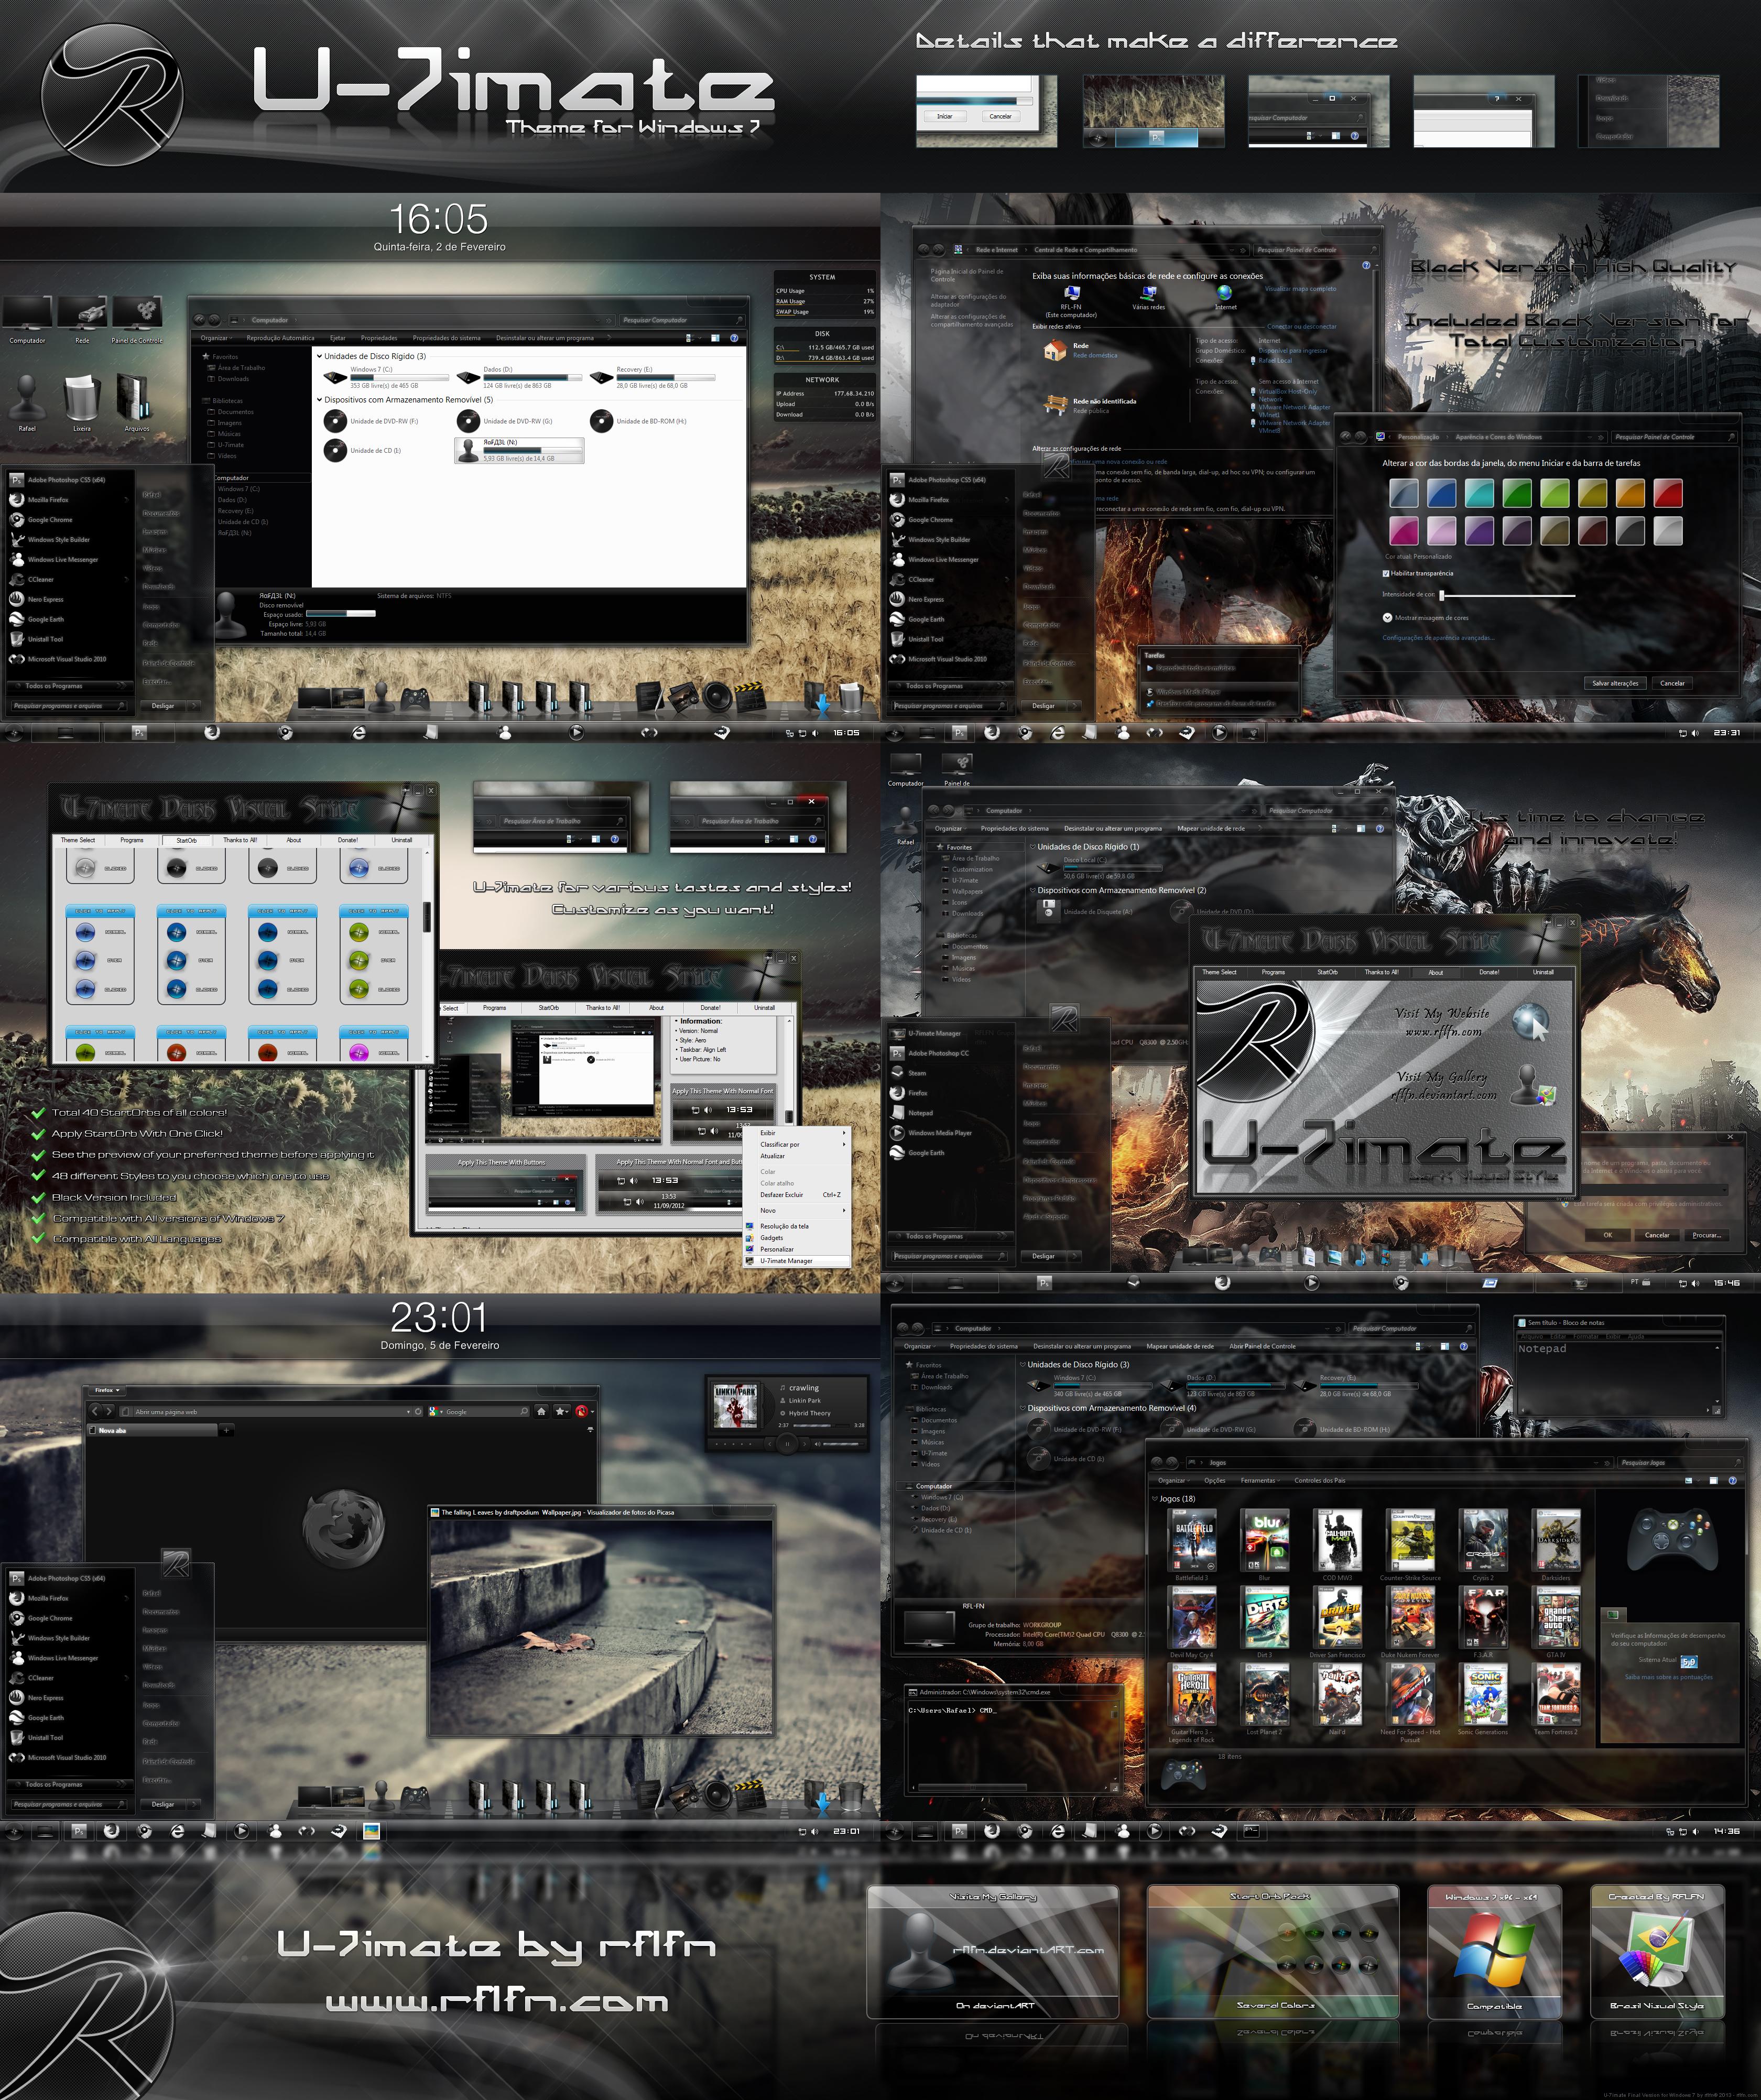 U-7imate Final Version for Windows 7 by rflfn